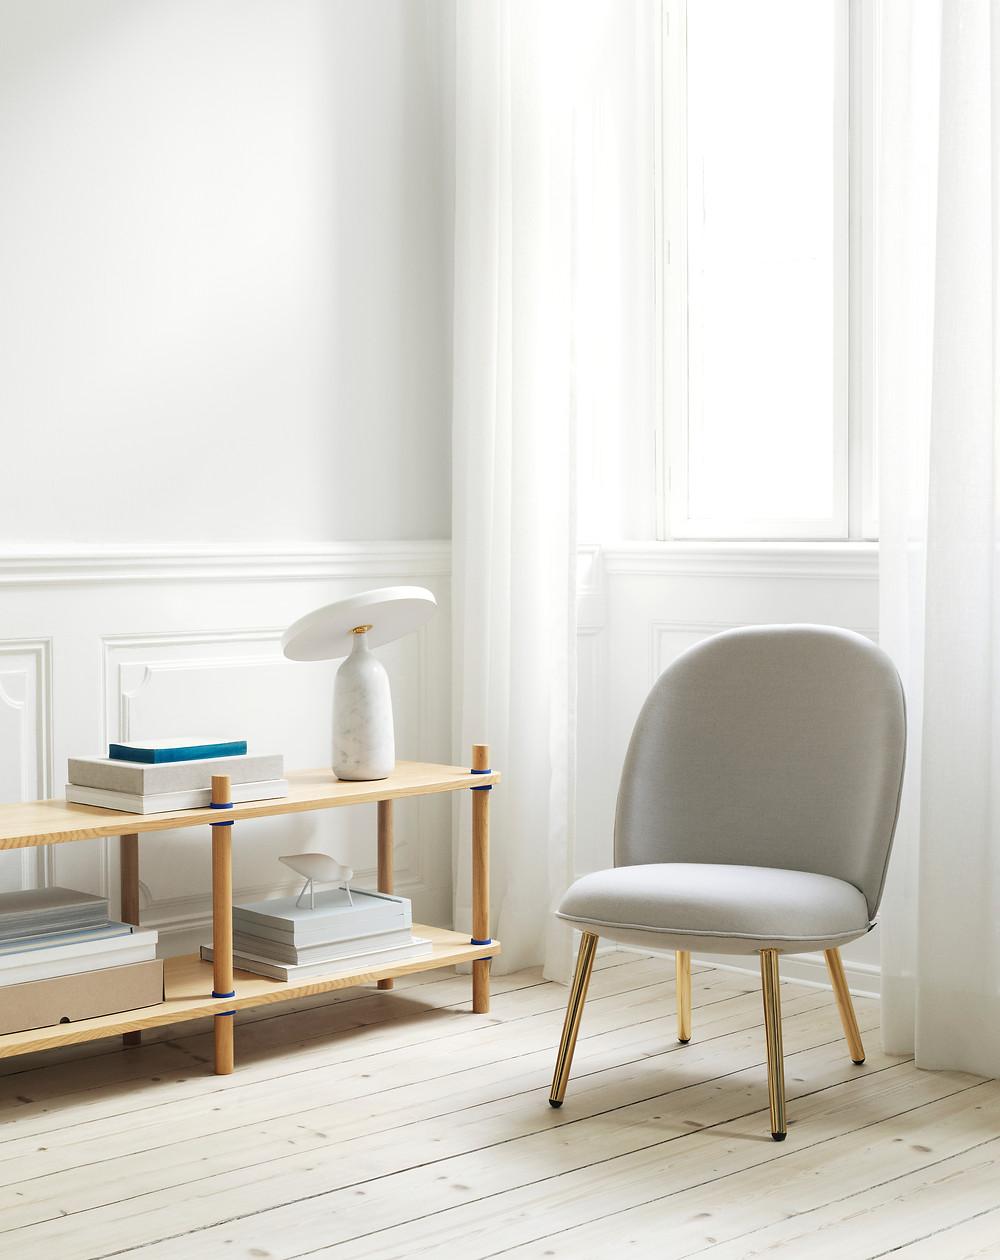 Less is more, Scandinavian interior